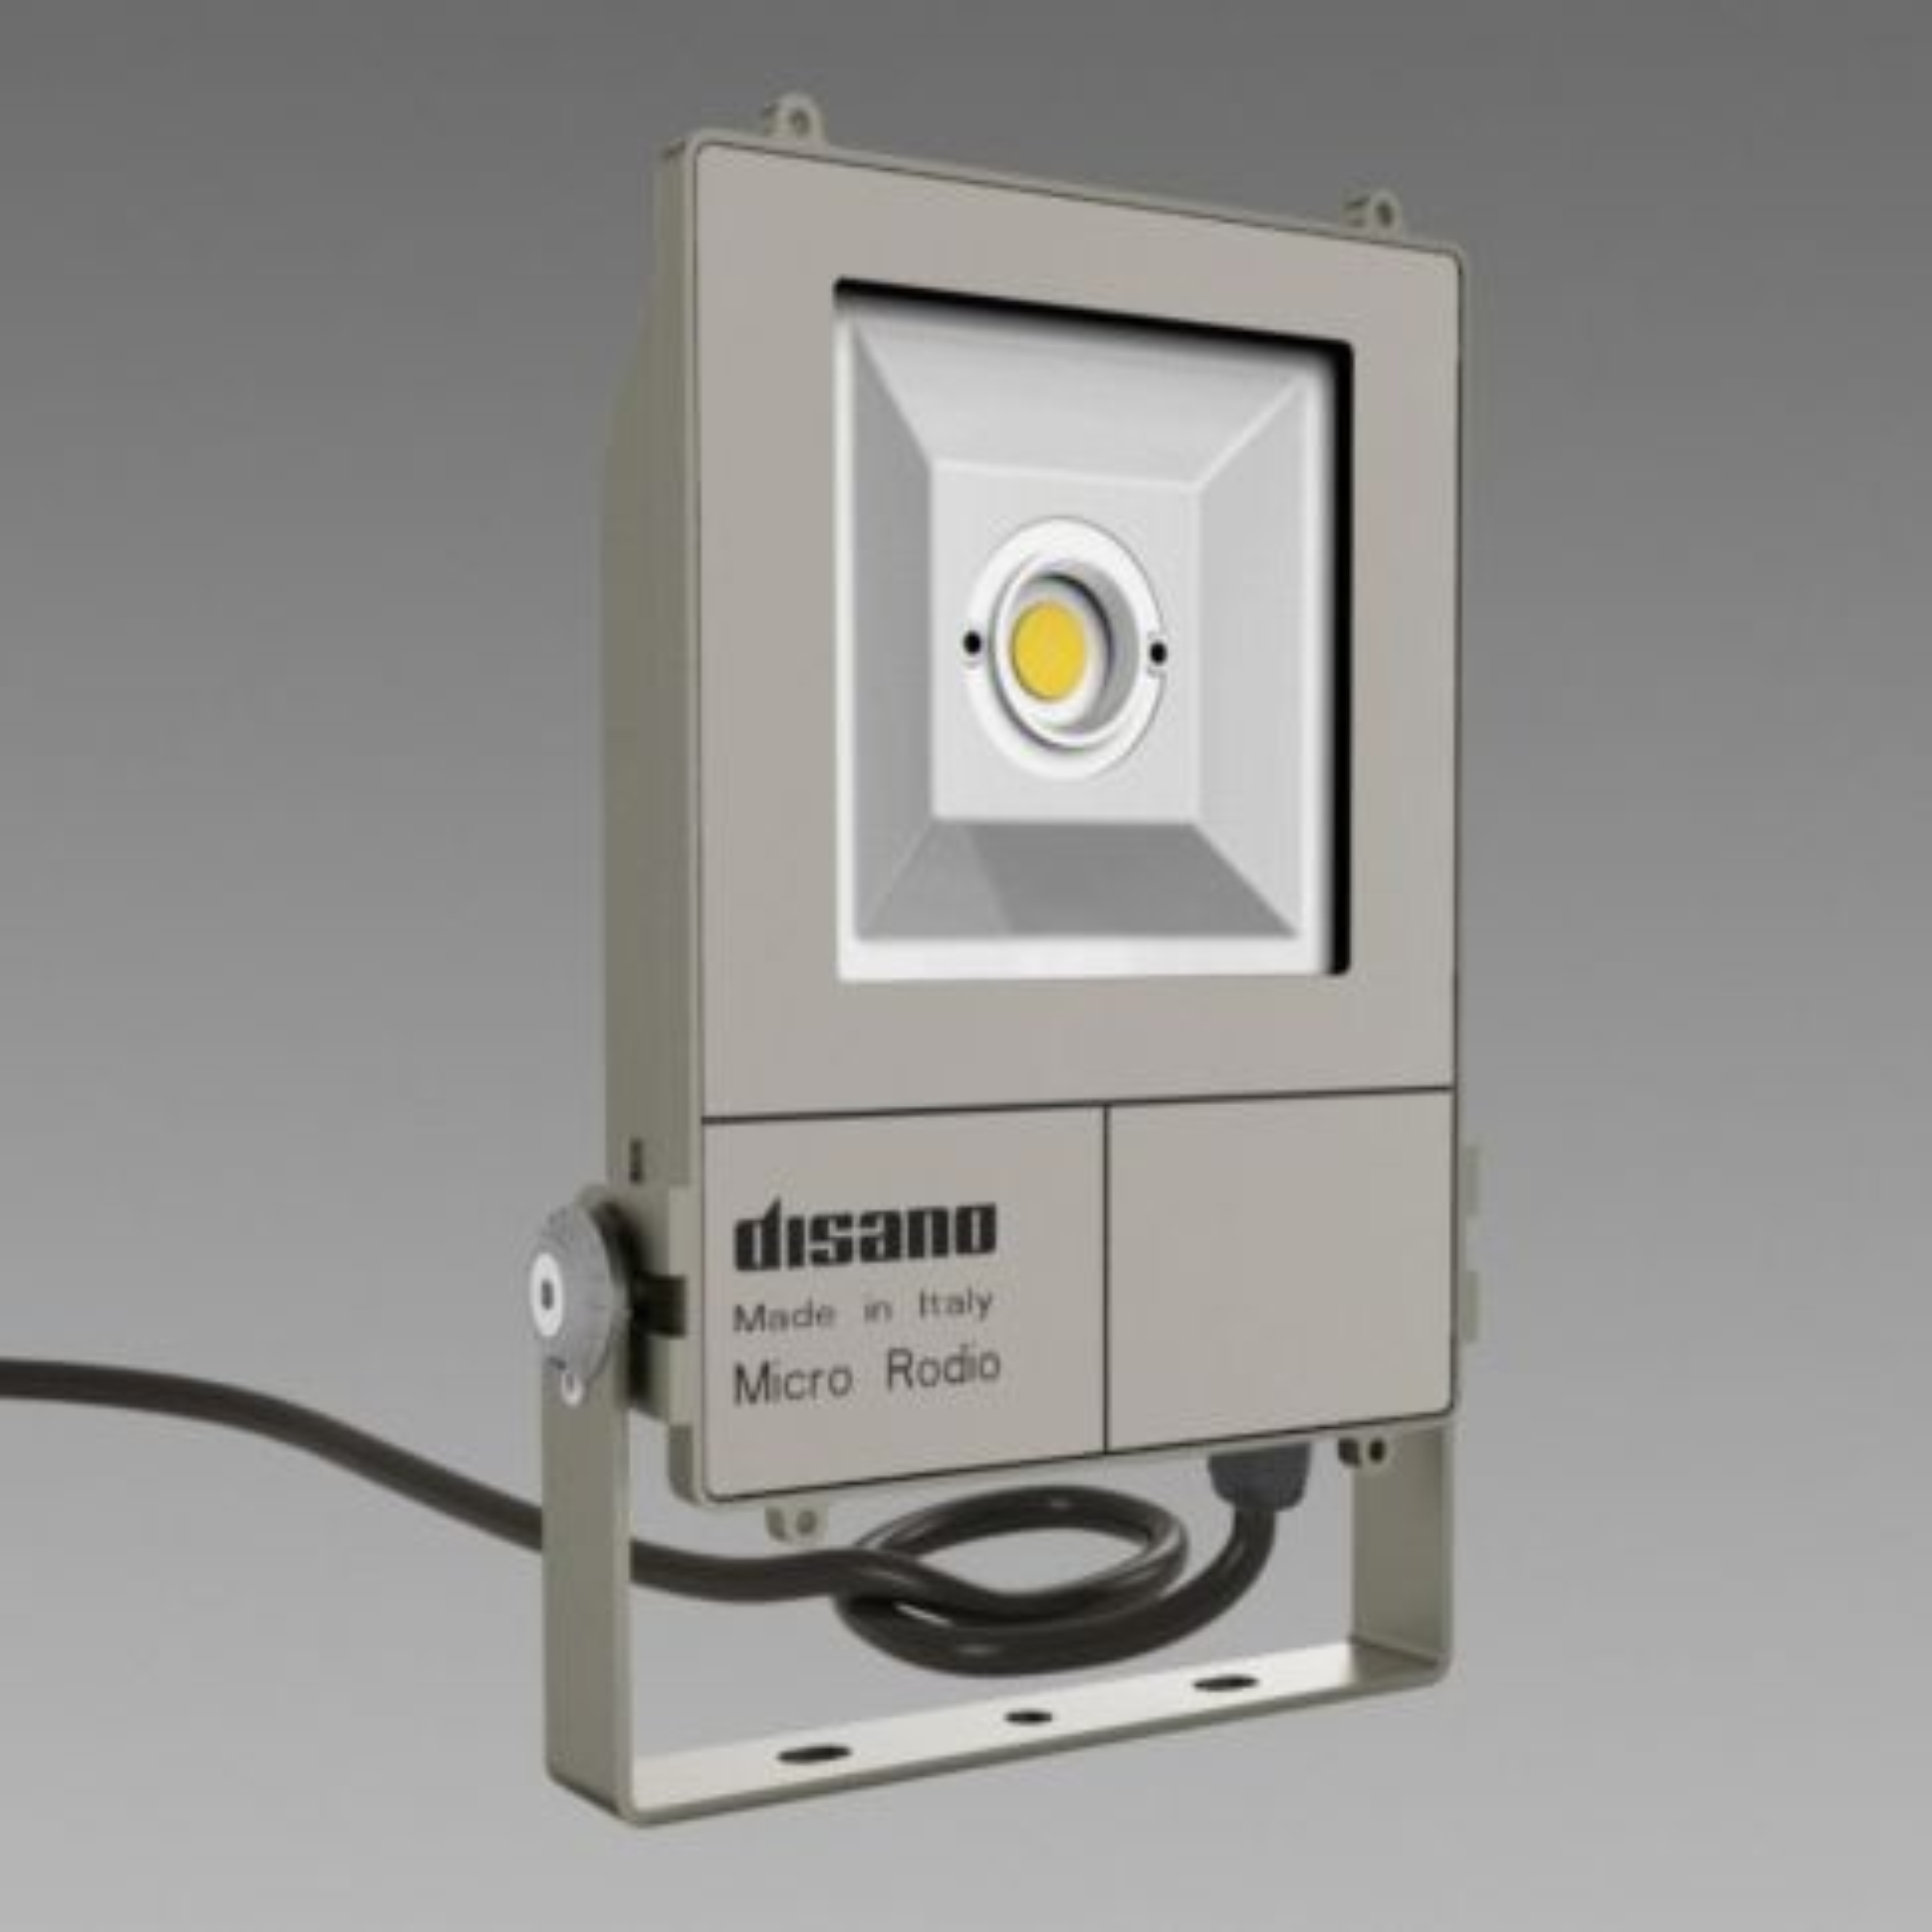 DISANO Svítidlo LED MICRORODIO 1980 29W 2483lm 4000K bílá IP66